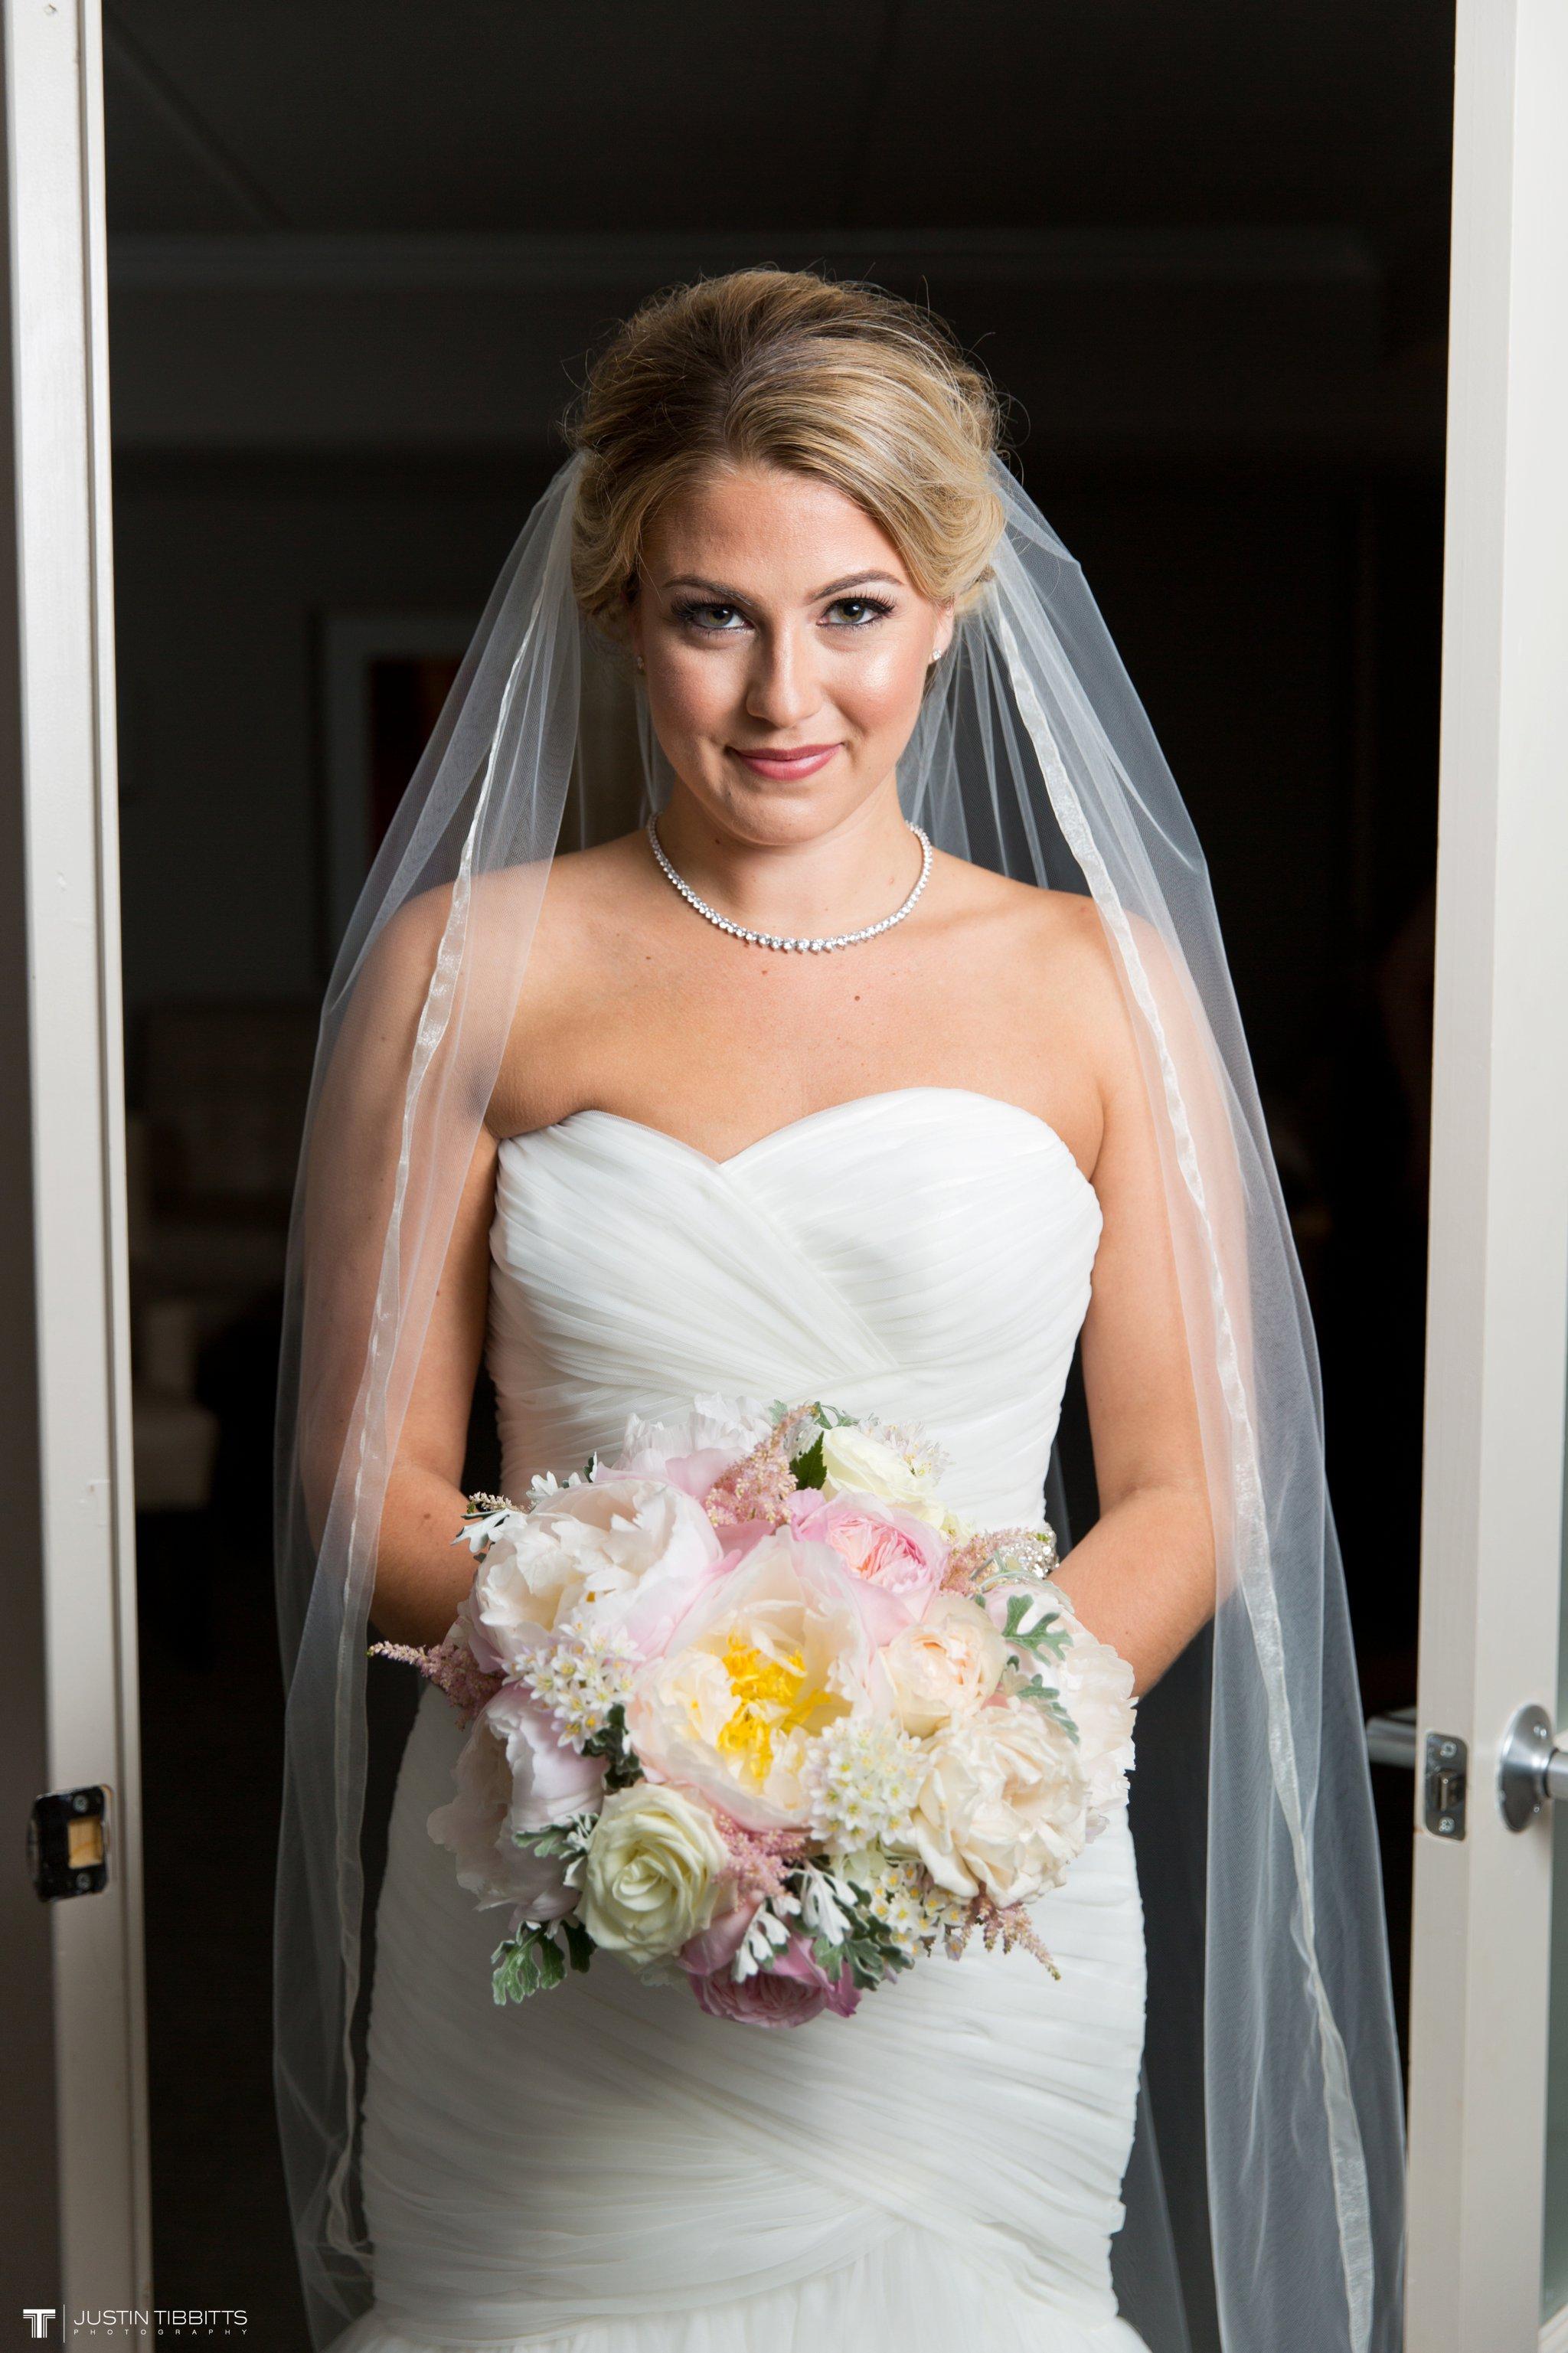 state-room-wedding-photos-with-amanda-and-nick_0045